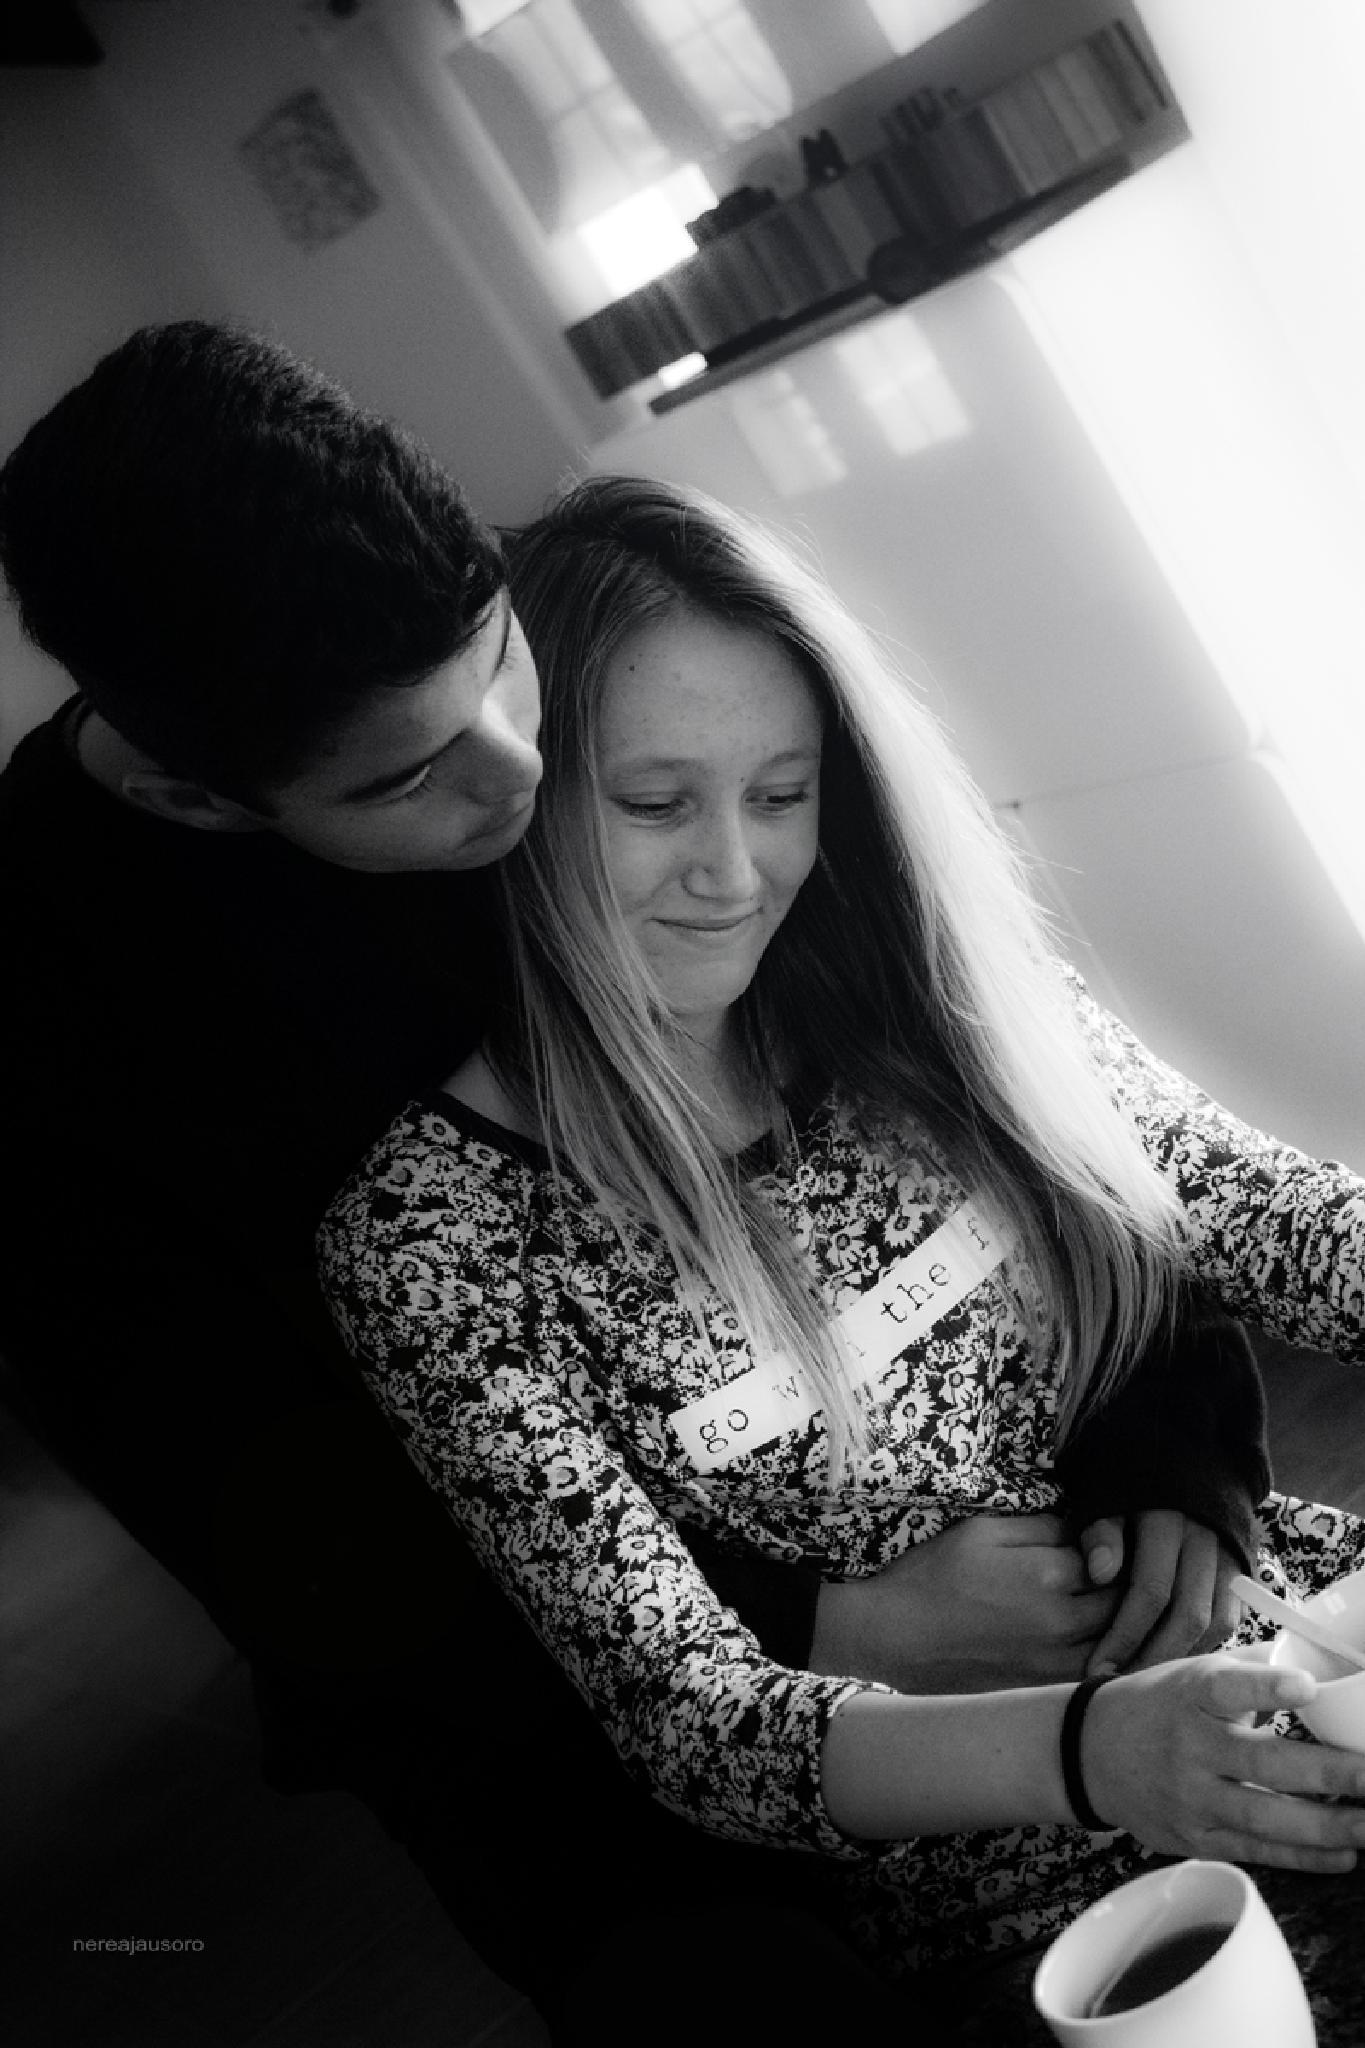 First Love by nereajausoro